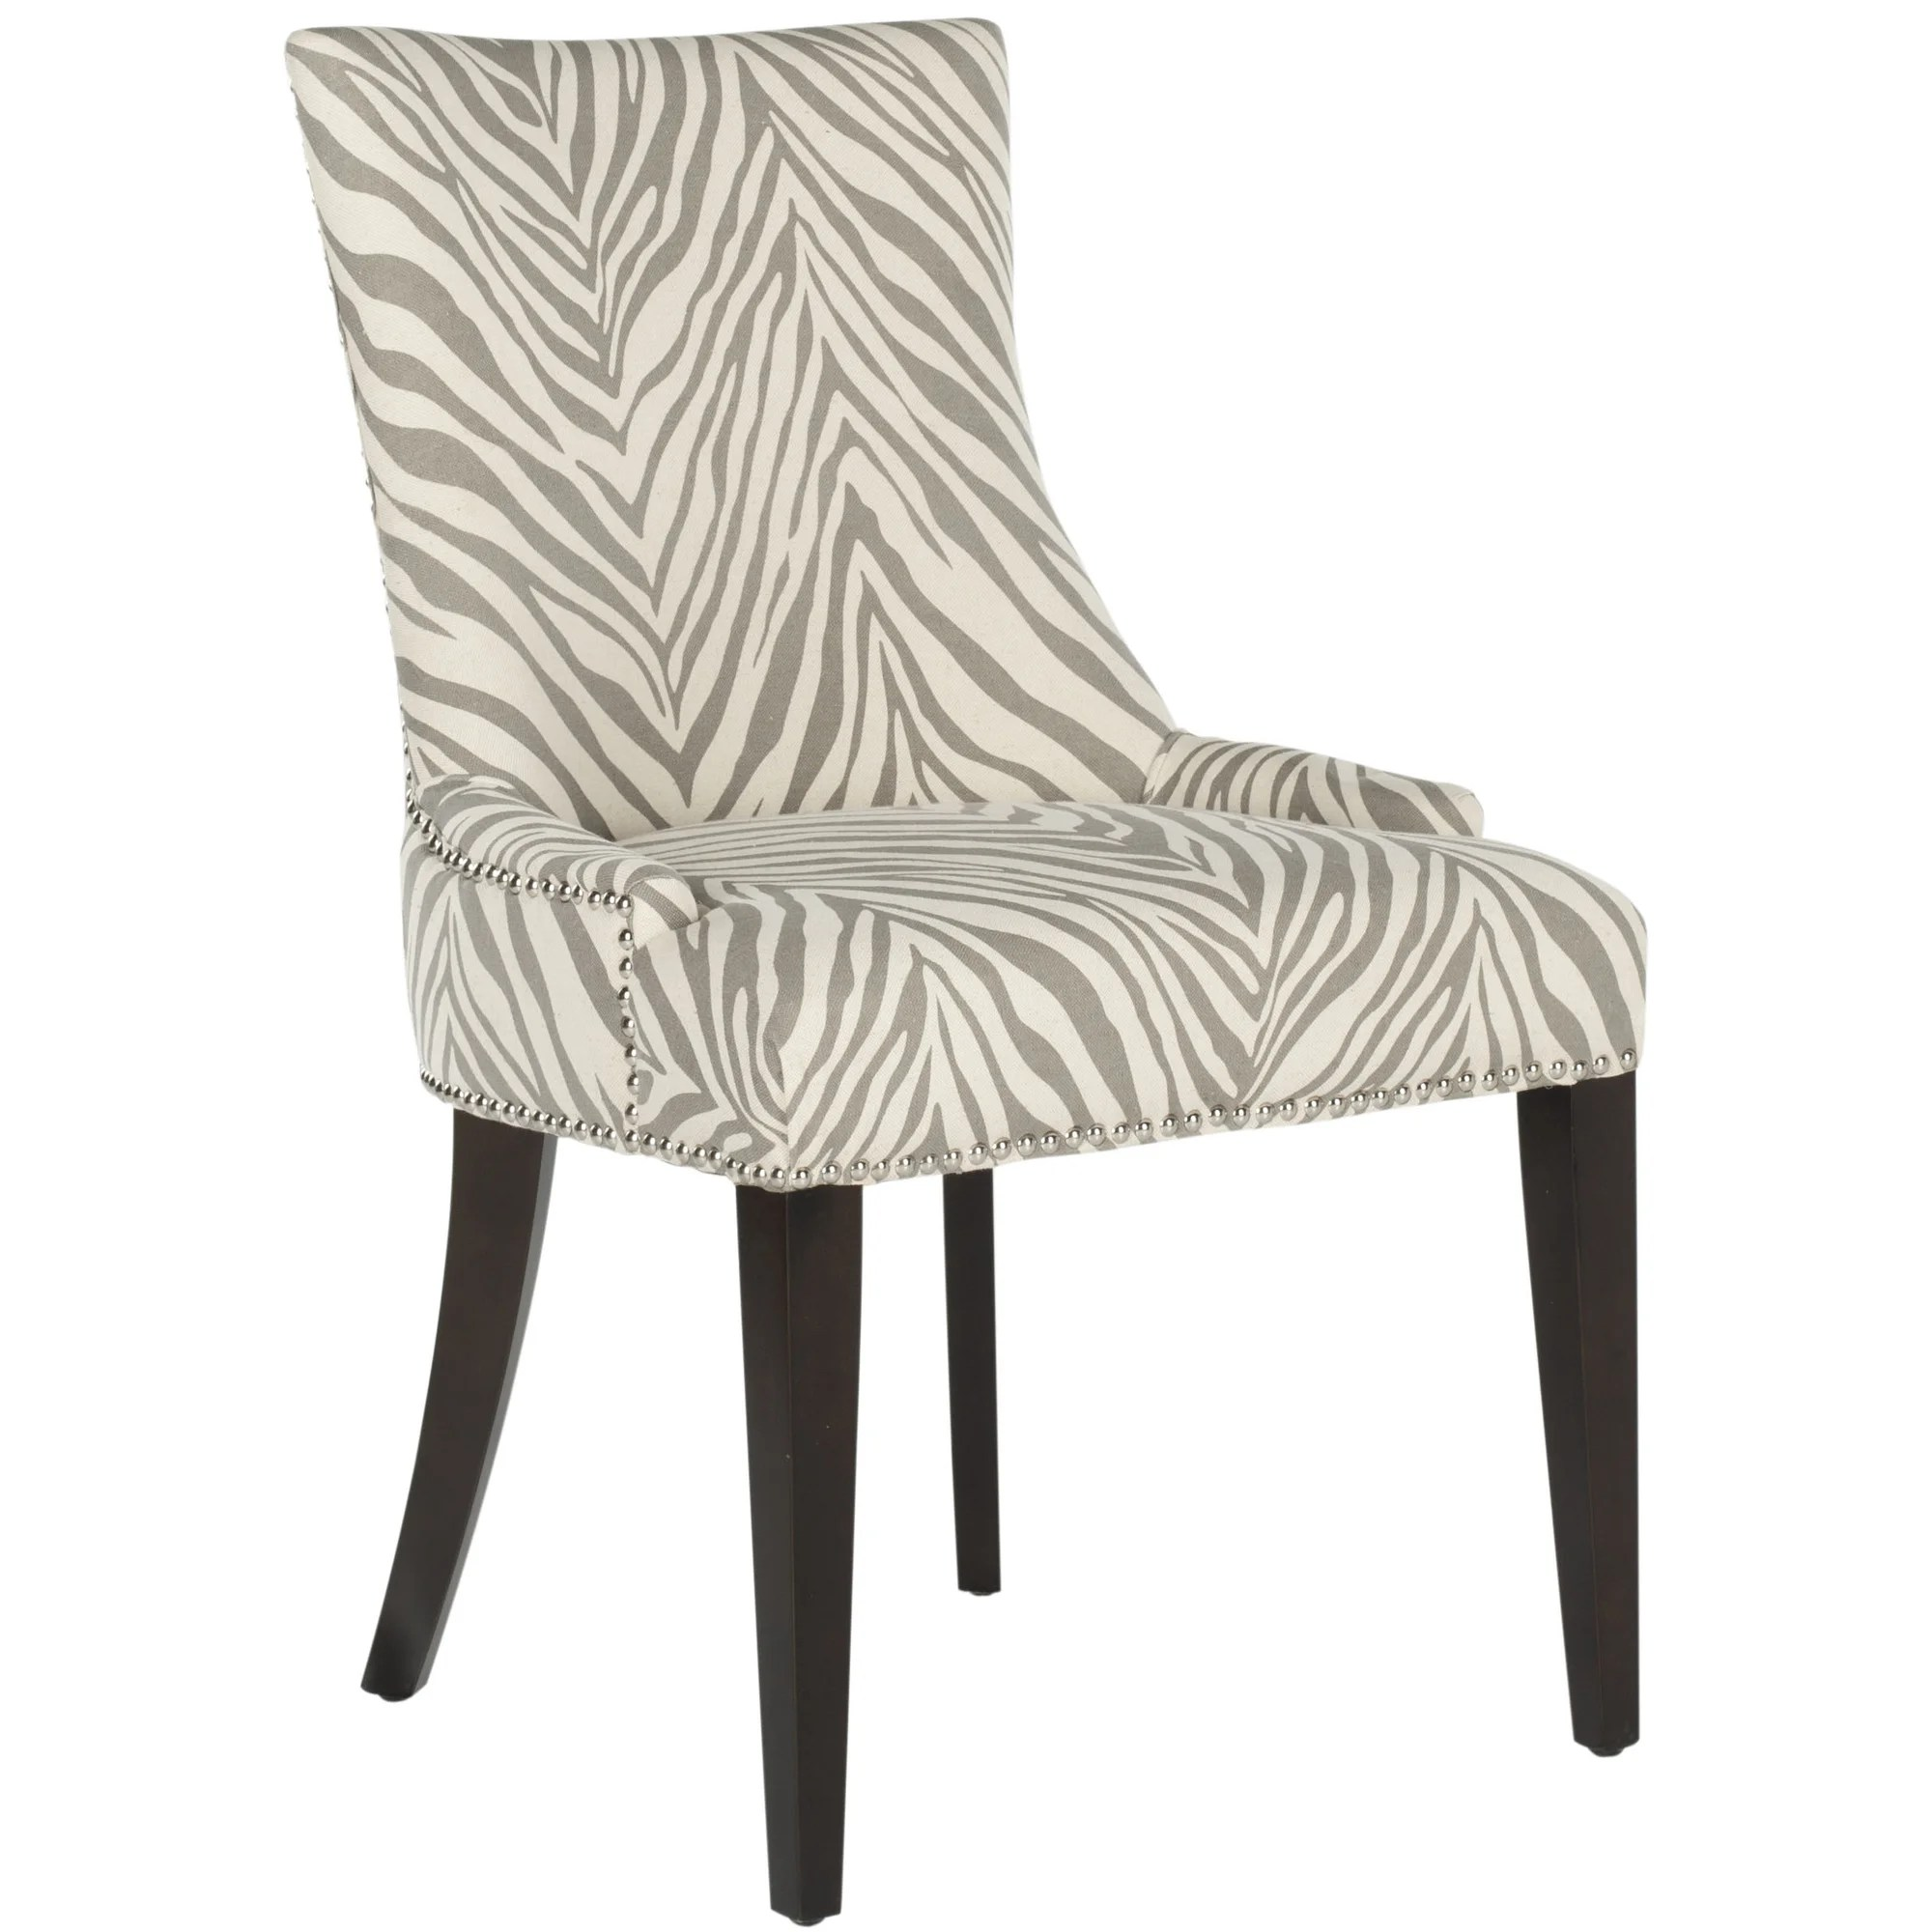 zebra dining chairs black white barber chair brayden studio alpha centauri upholstered side in